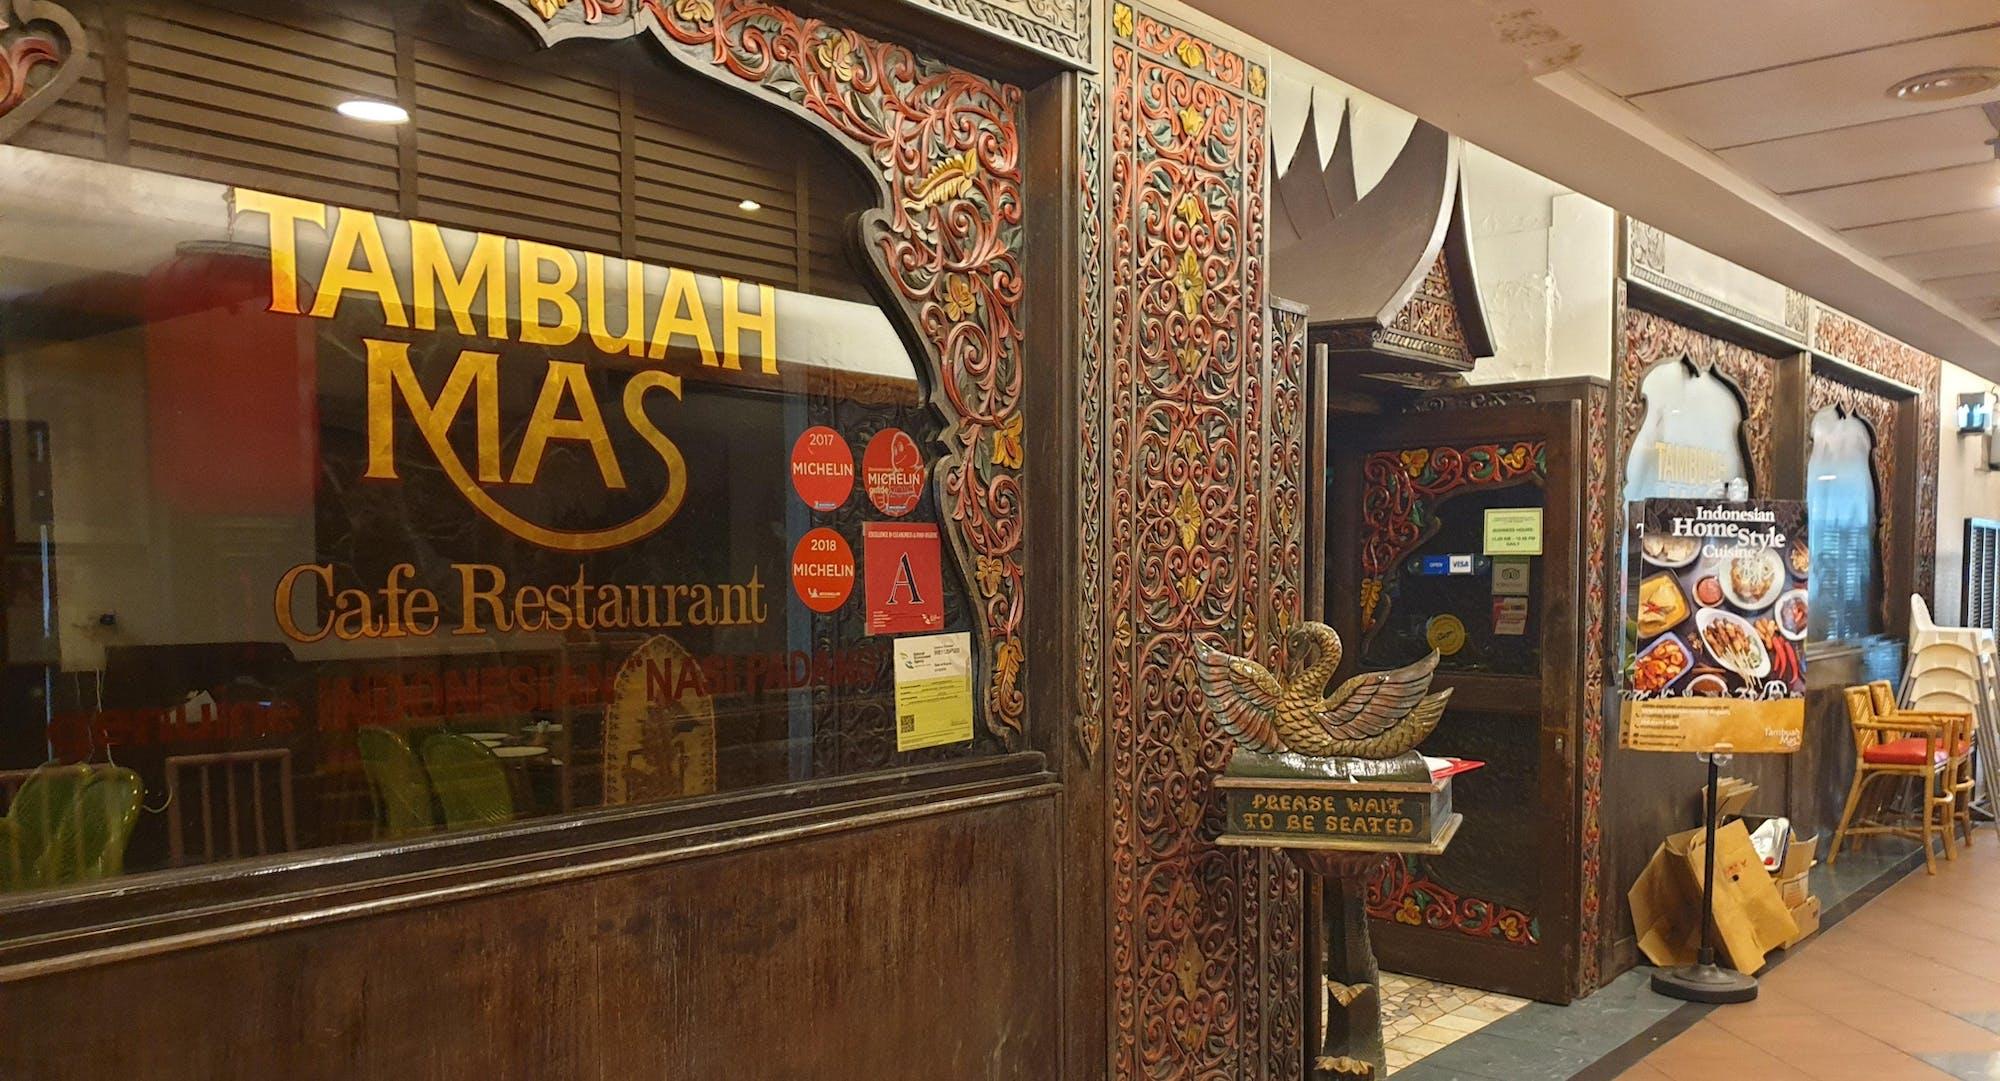 Indonesian restaurant Tambuah Mas